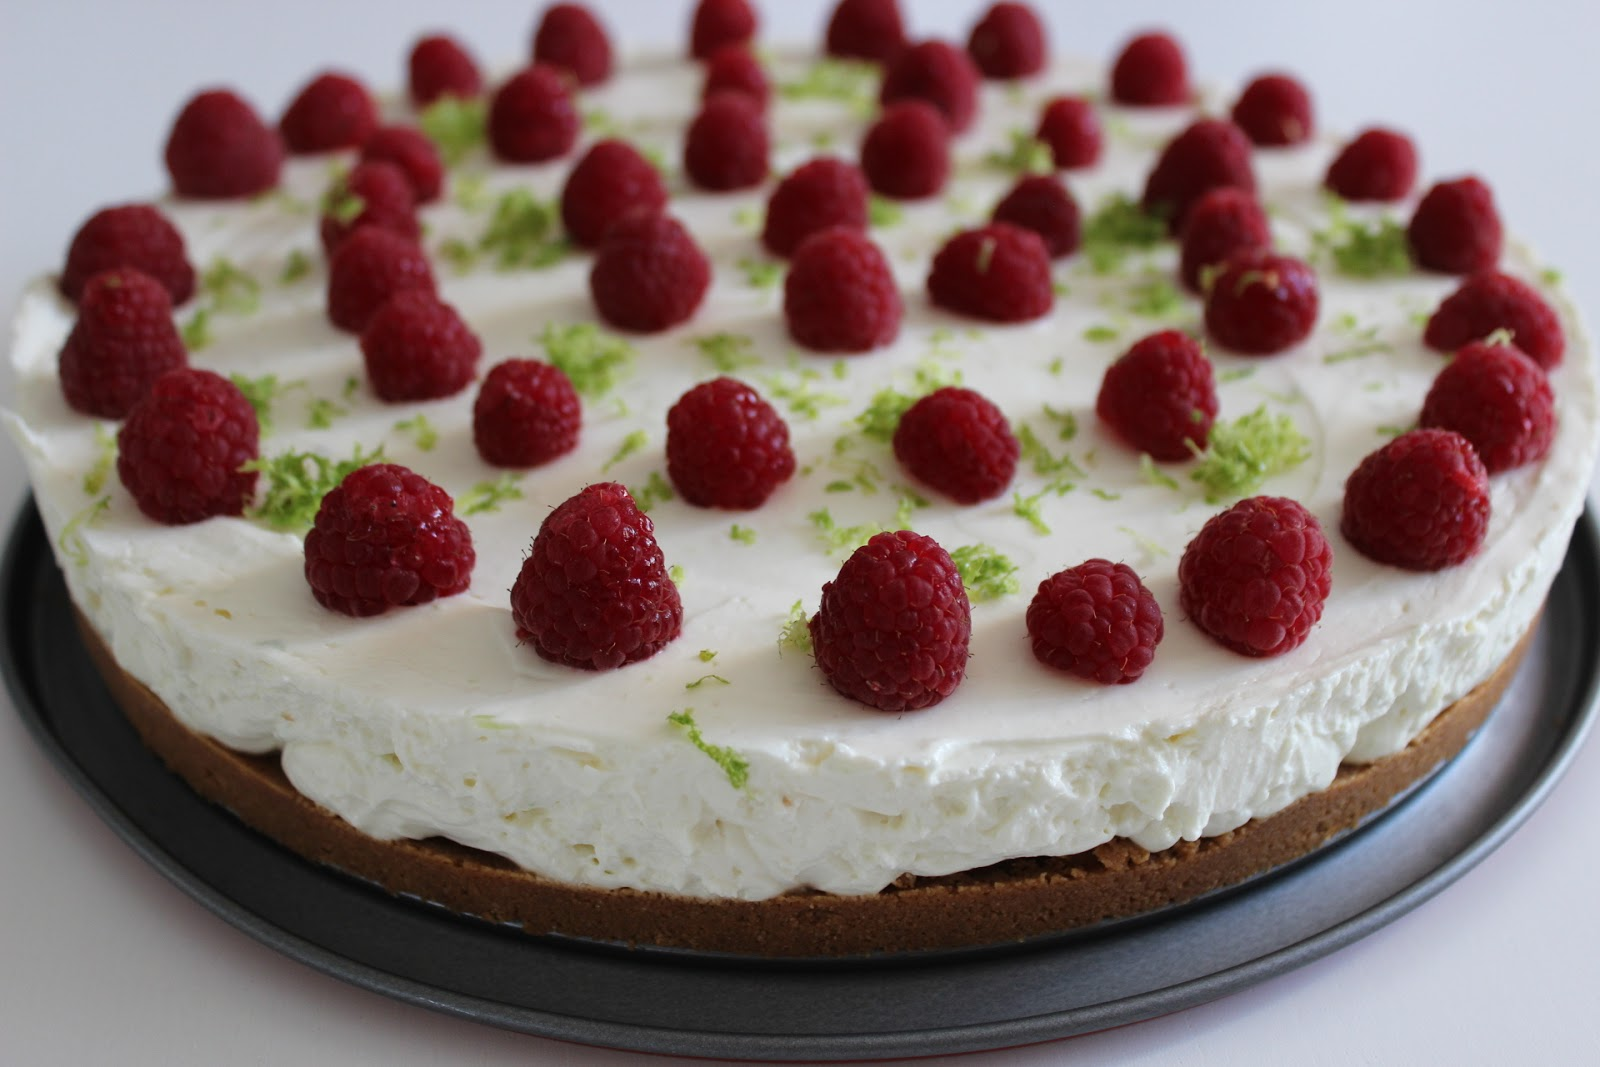 Les gourmandises de lydie cheesecake framboise citron vert sans cuisson - Cheesecake framboise sans cuisson ...